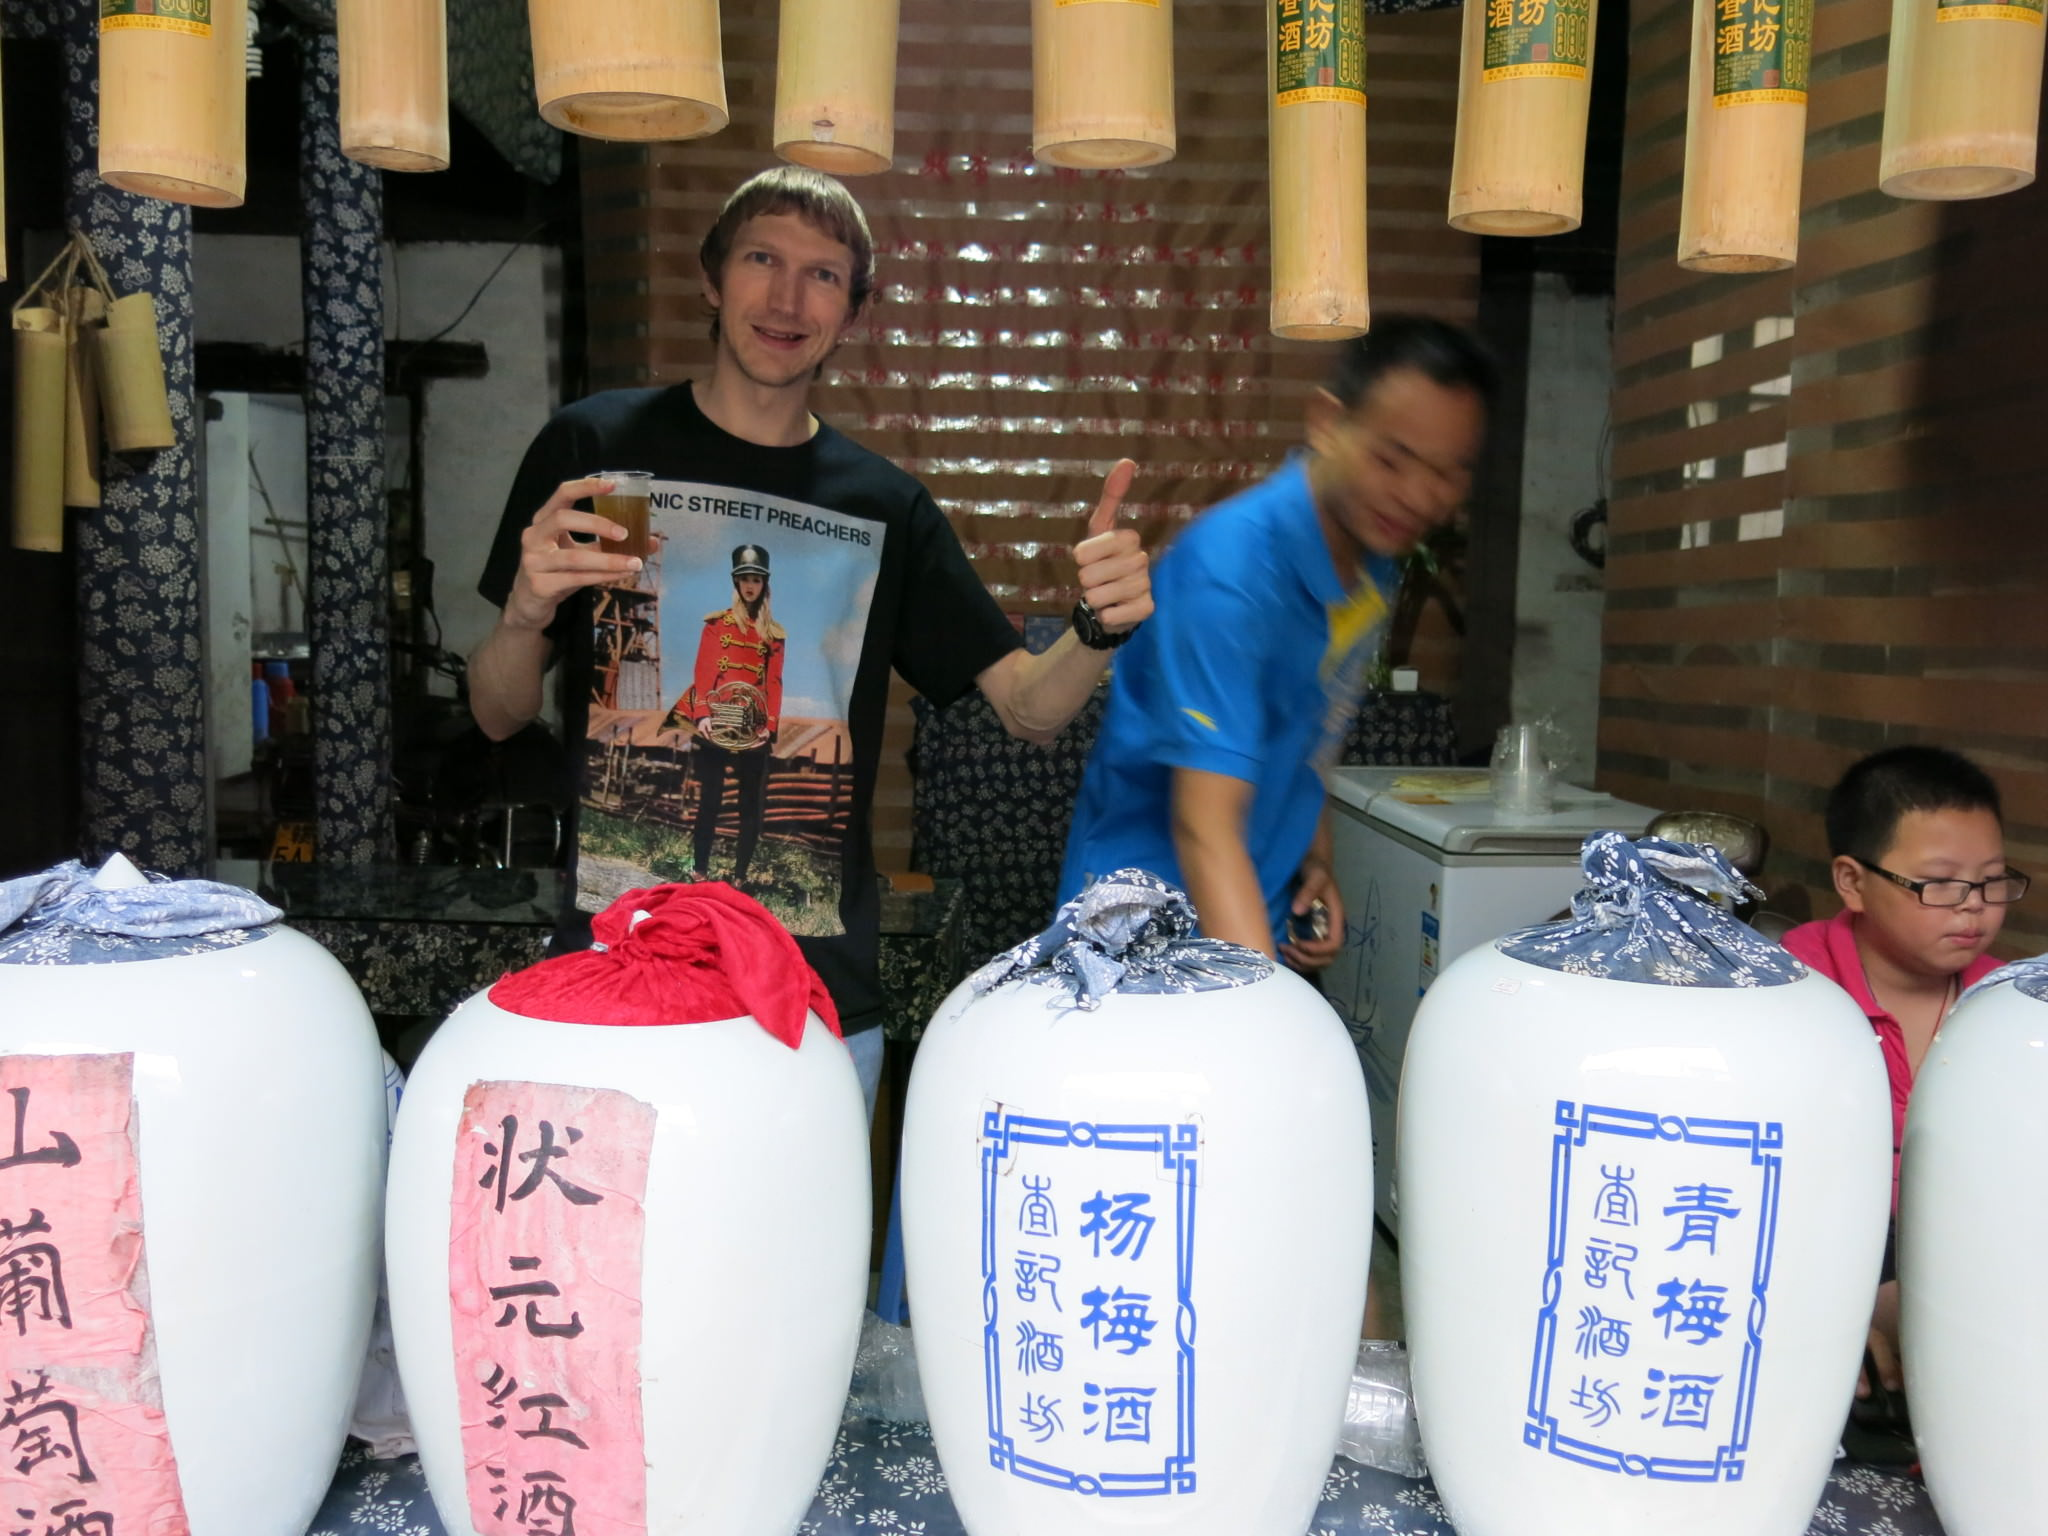 xiaoqi village china peach wine